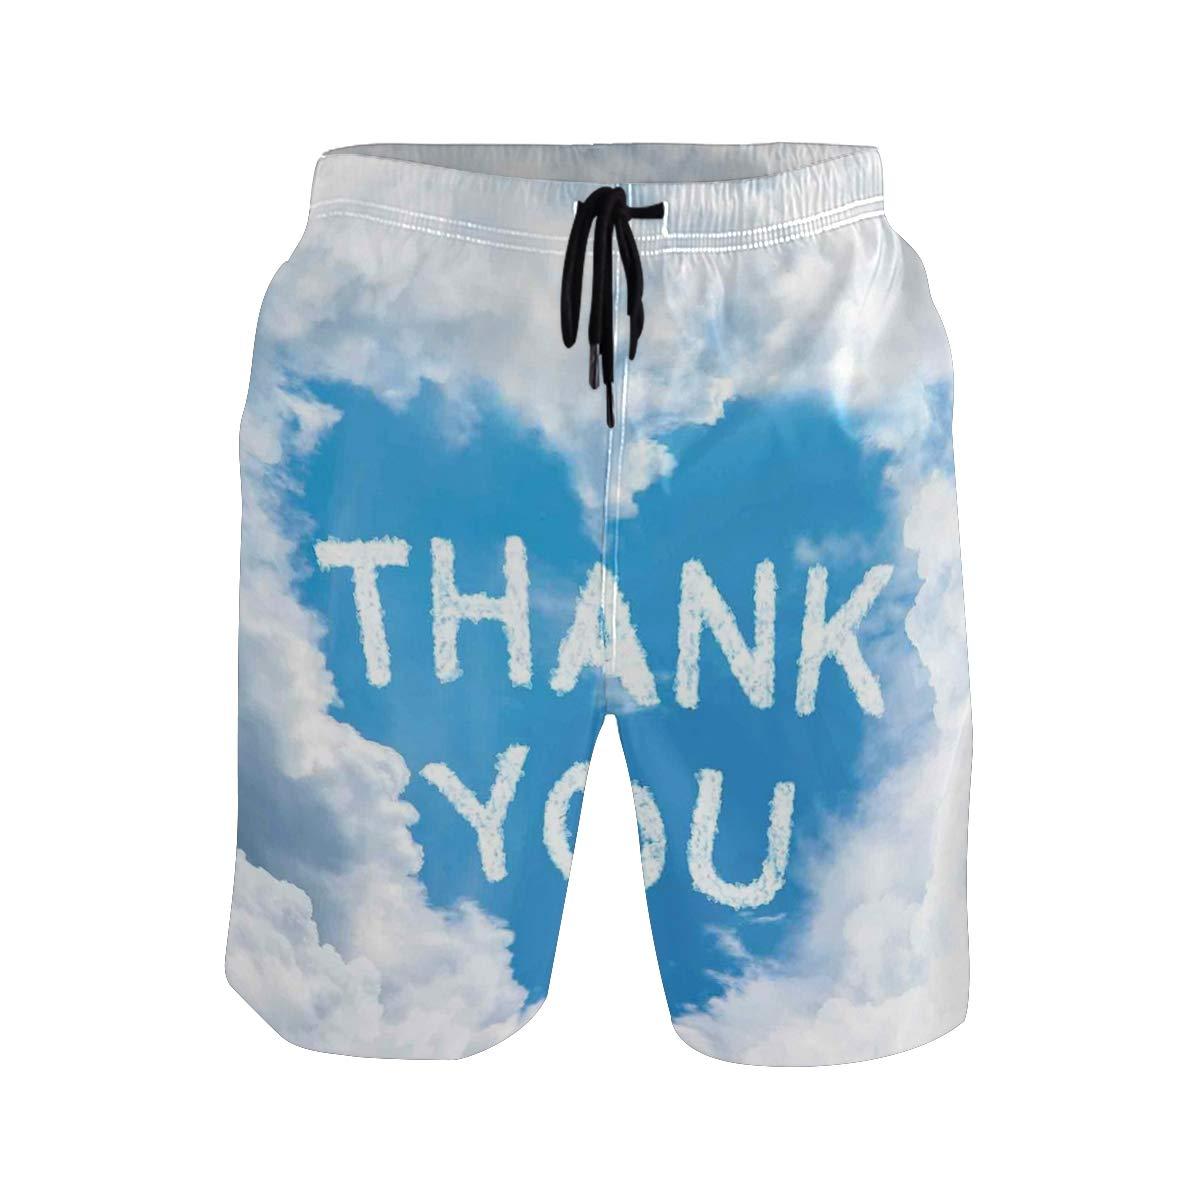 KVMV Writings On Air Heart Shaped Cloud Thank You Girlfriend and Boyfriend Quick Dry Beach Shorts